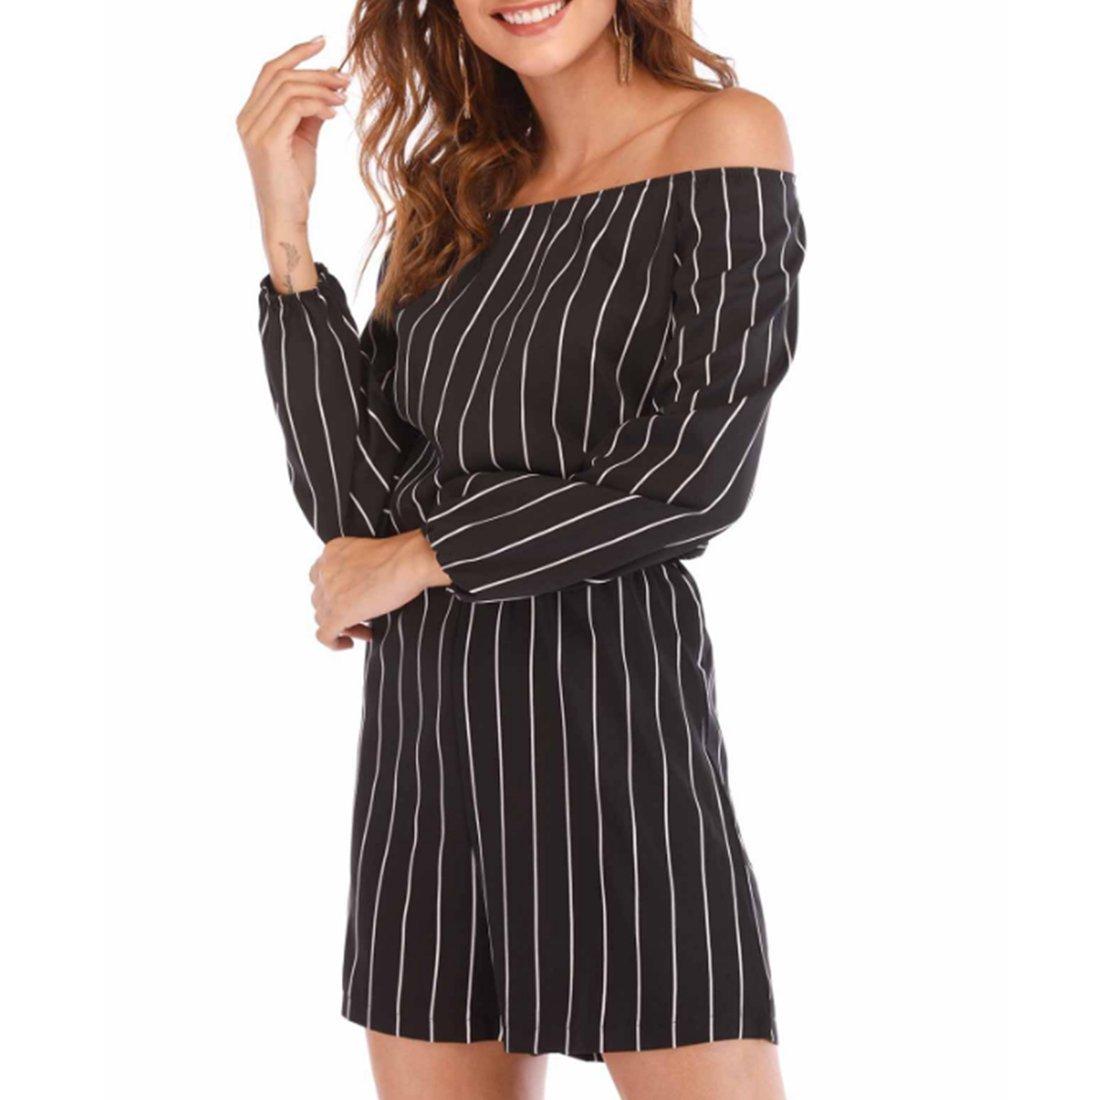 8d7b3622c424 Amazon.com  NEXLOMOS Womens Summer Casual Vertical Stripes Off Shoulder  Long Sleeve Short Jumpsuit Romper  Clothing